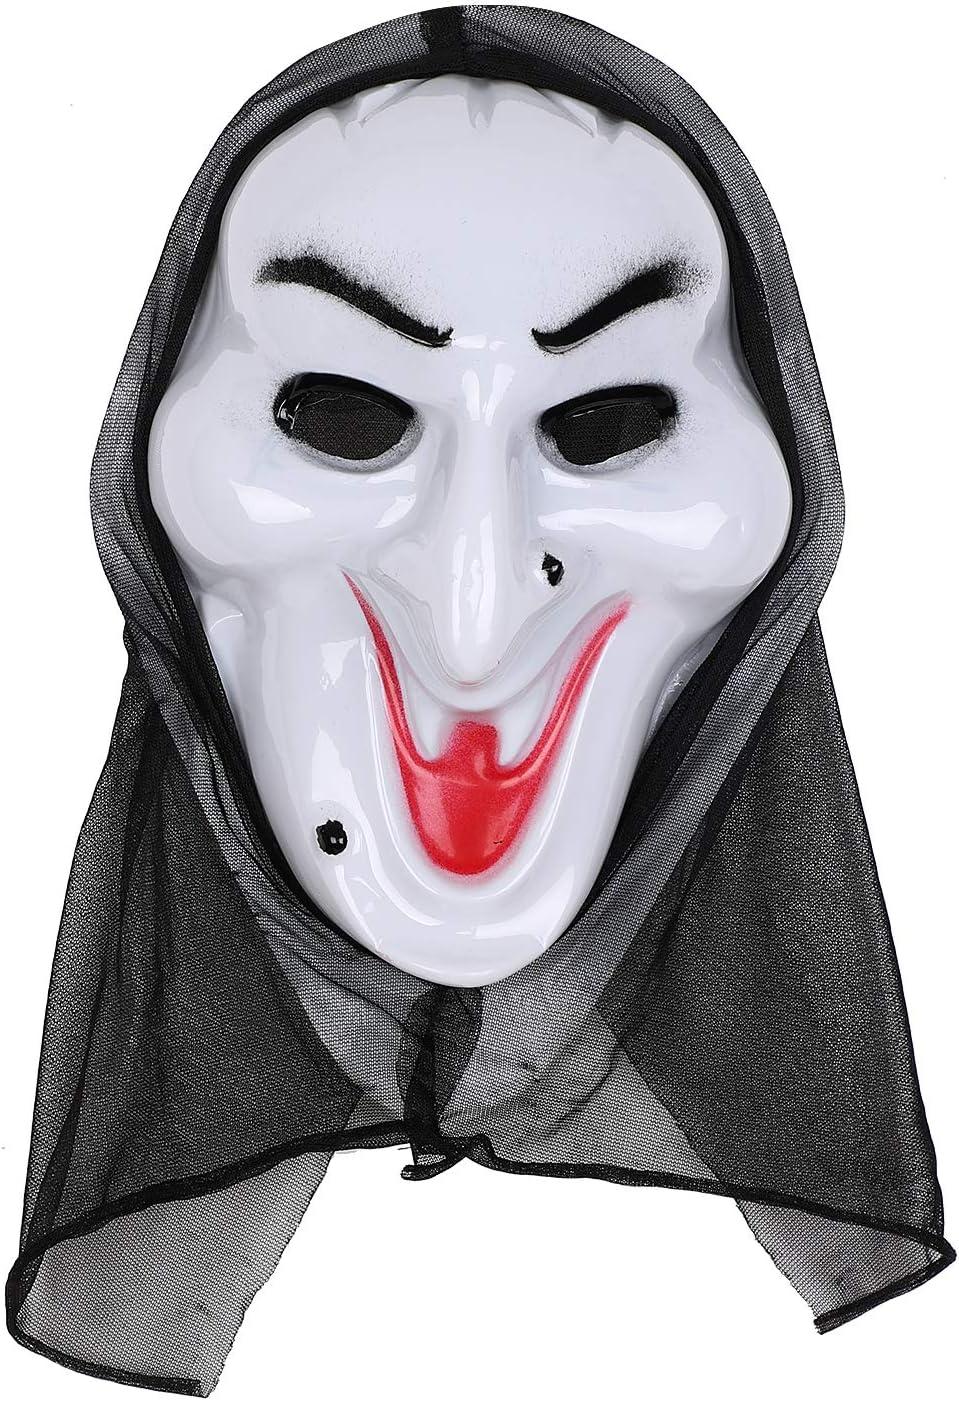 Horrific Scary Full Face Masquerade Fancy Ball Halloween Lightweight Mask